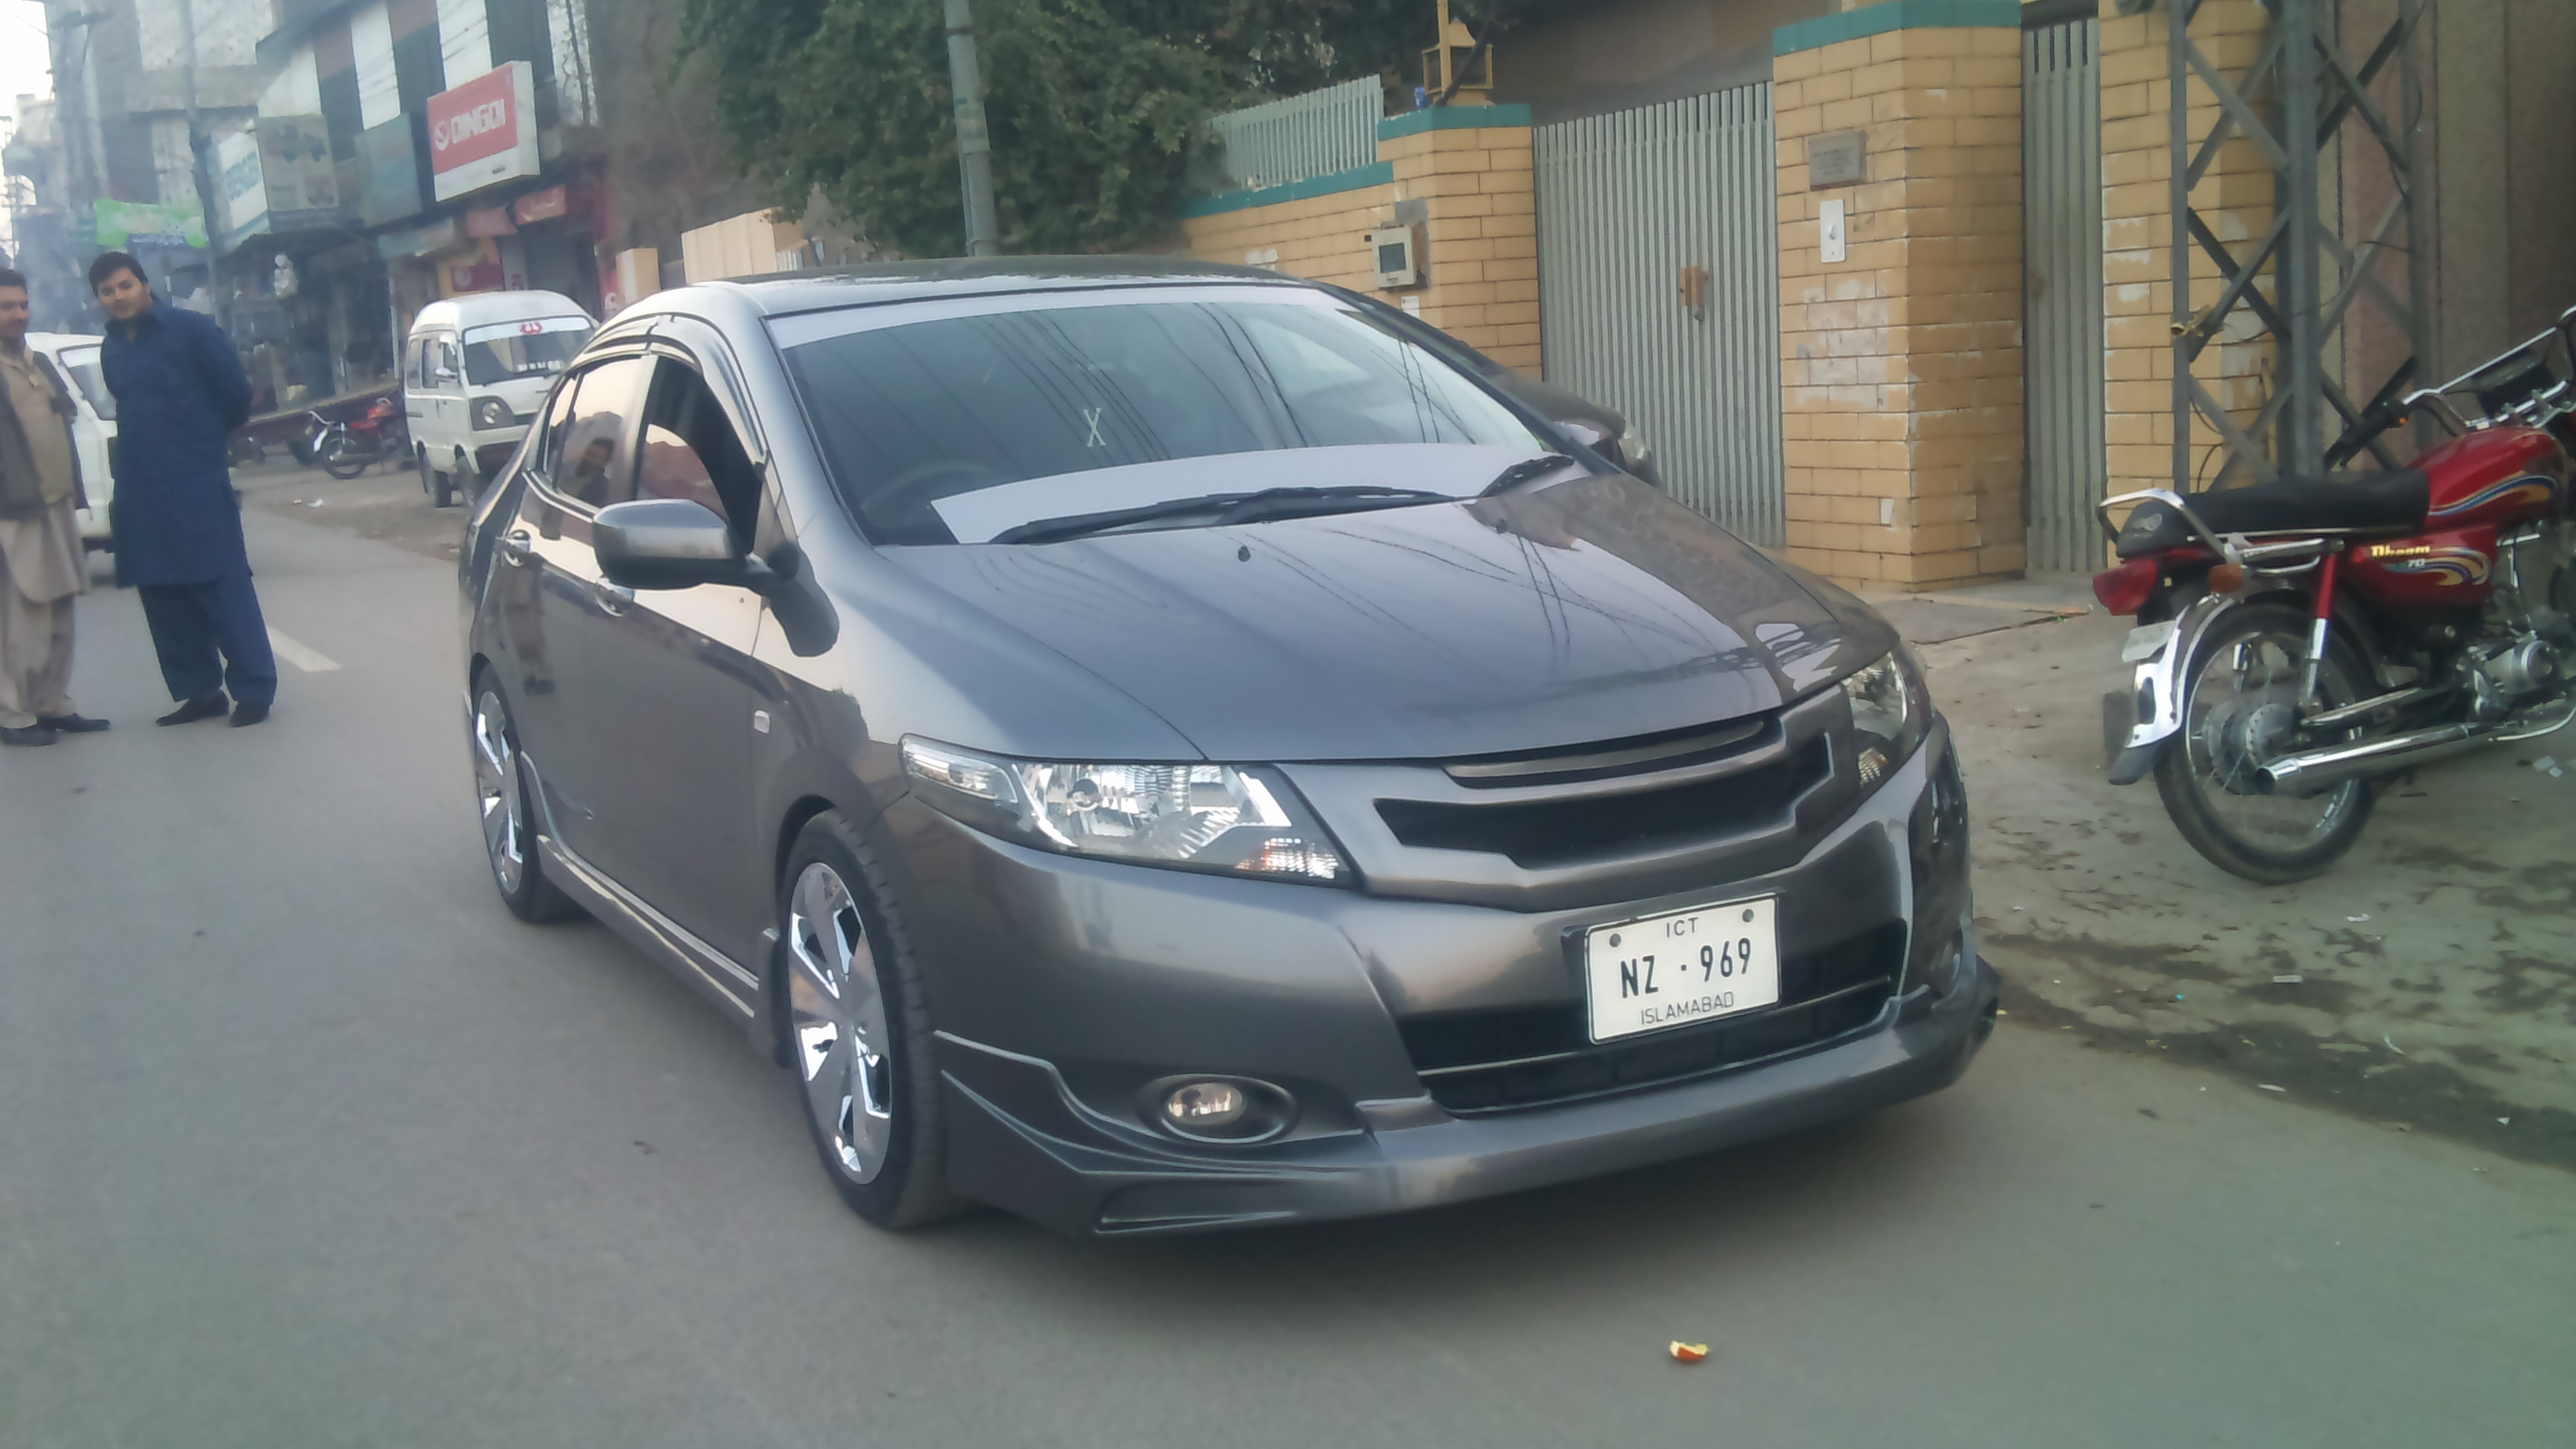 Rims On Car App >> Honda City 2010 of knoome83 - Member Ride 14236 | PakWheels